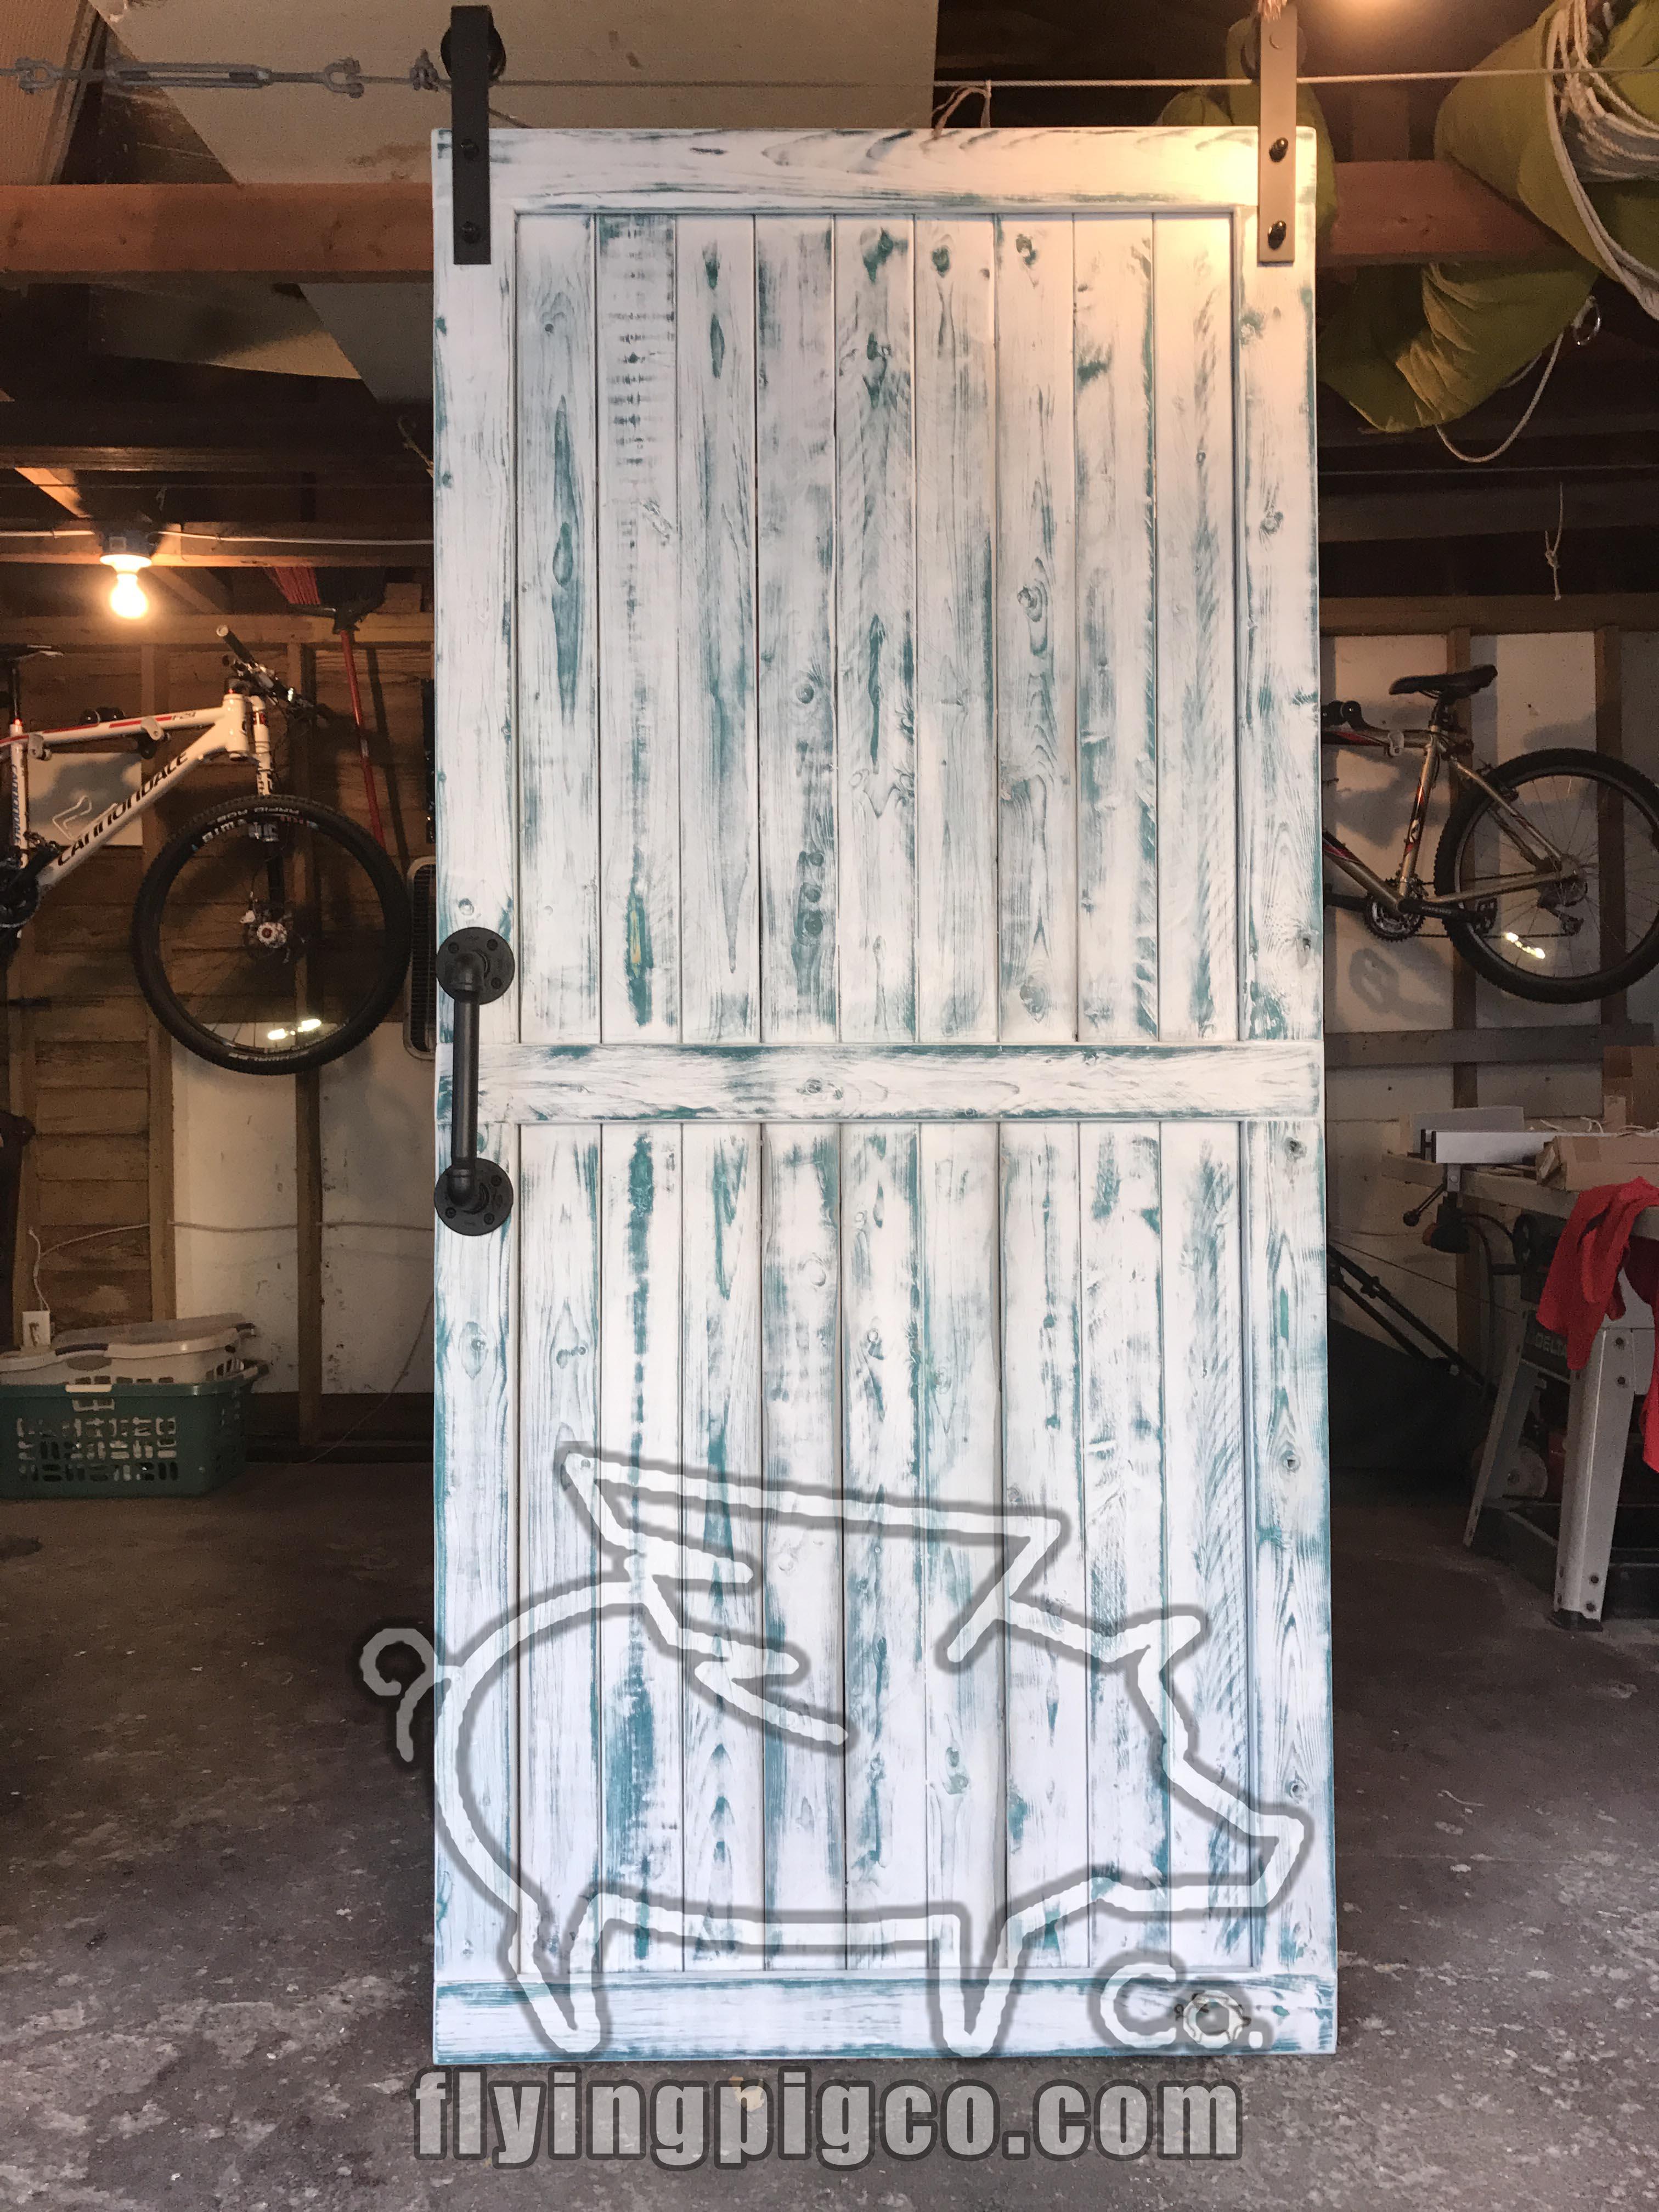 UNIQUE DISTRESSED BARN DOOR 10 & Unique Distressed Doors   Flying Pig Co.